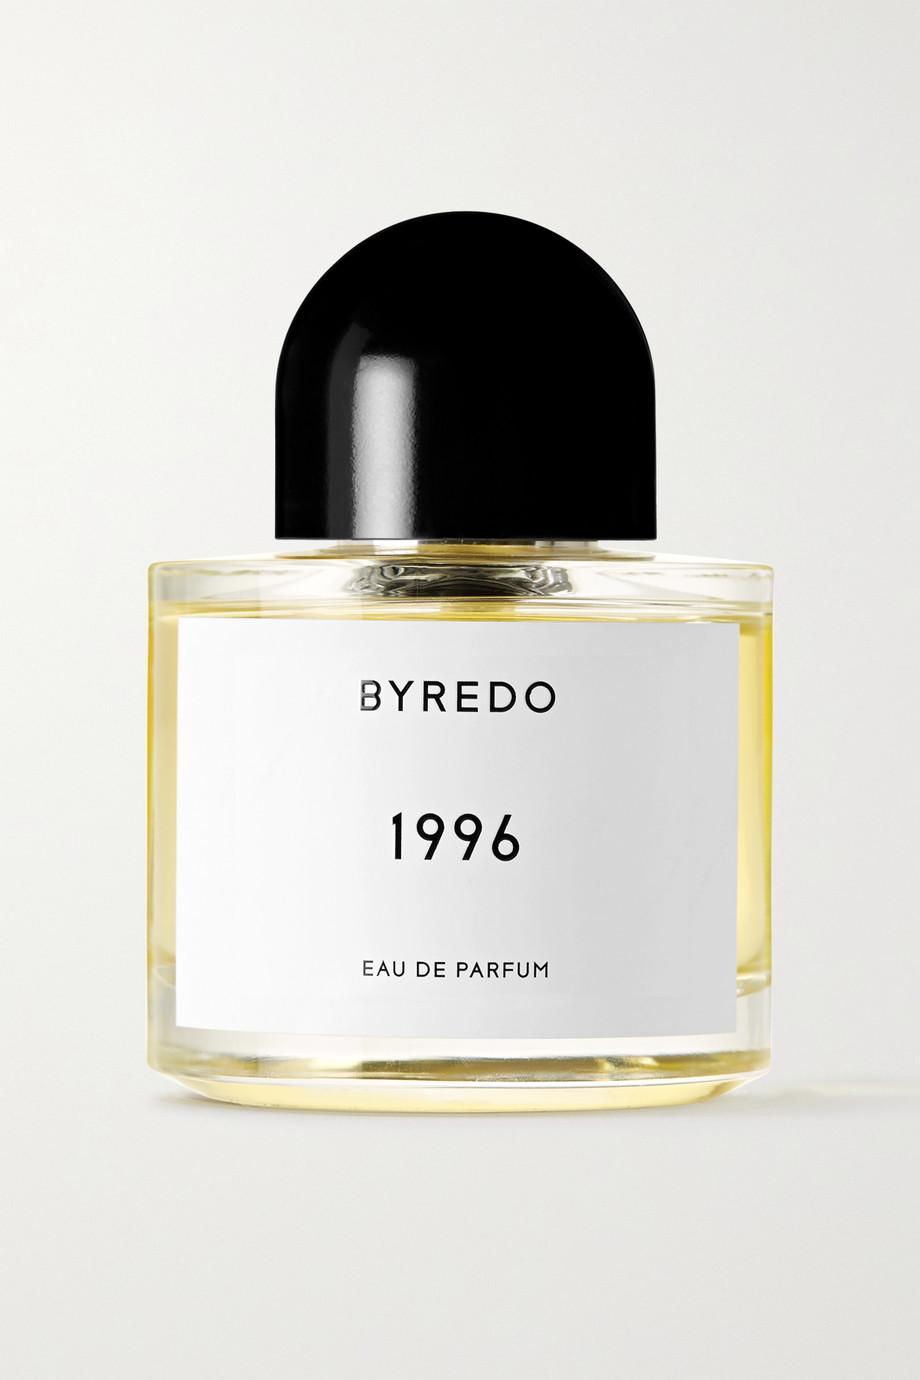 Byredo Eau de Parfum - 1996, 100ml